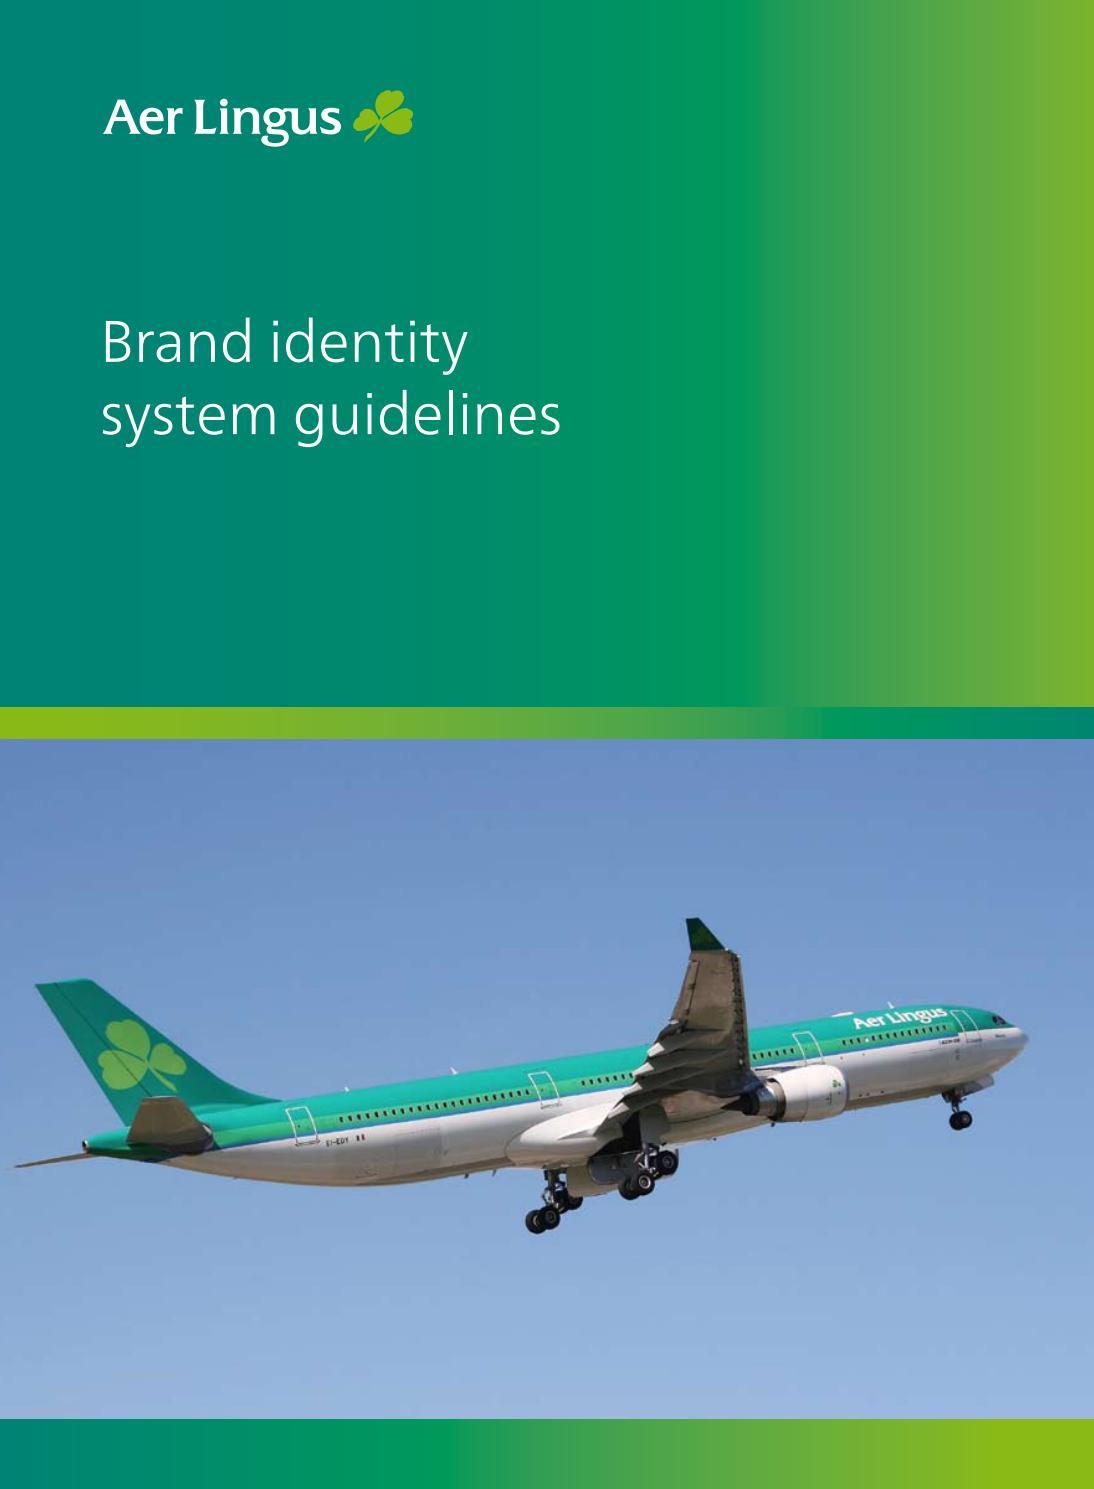 Aerlingus Brand Identity System Guidlines by Lukasz